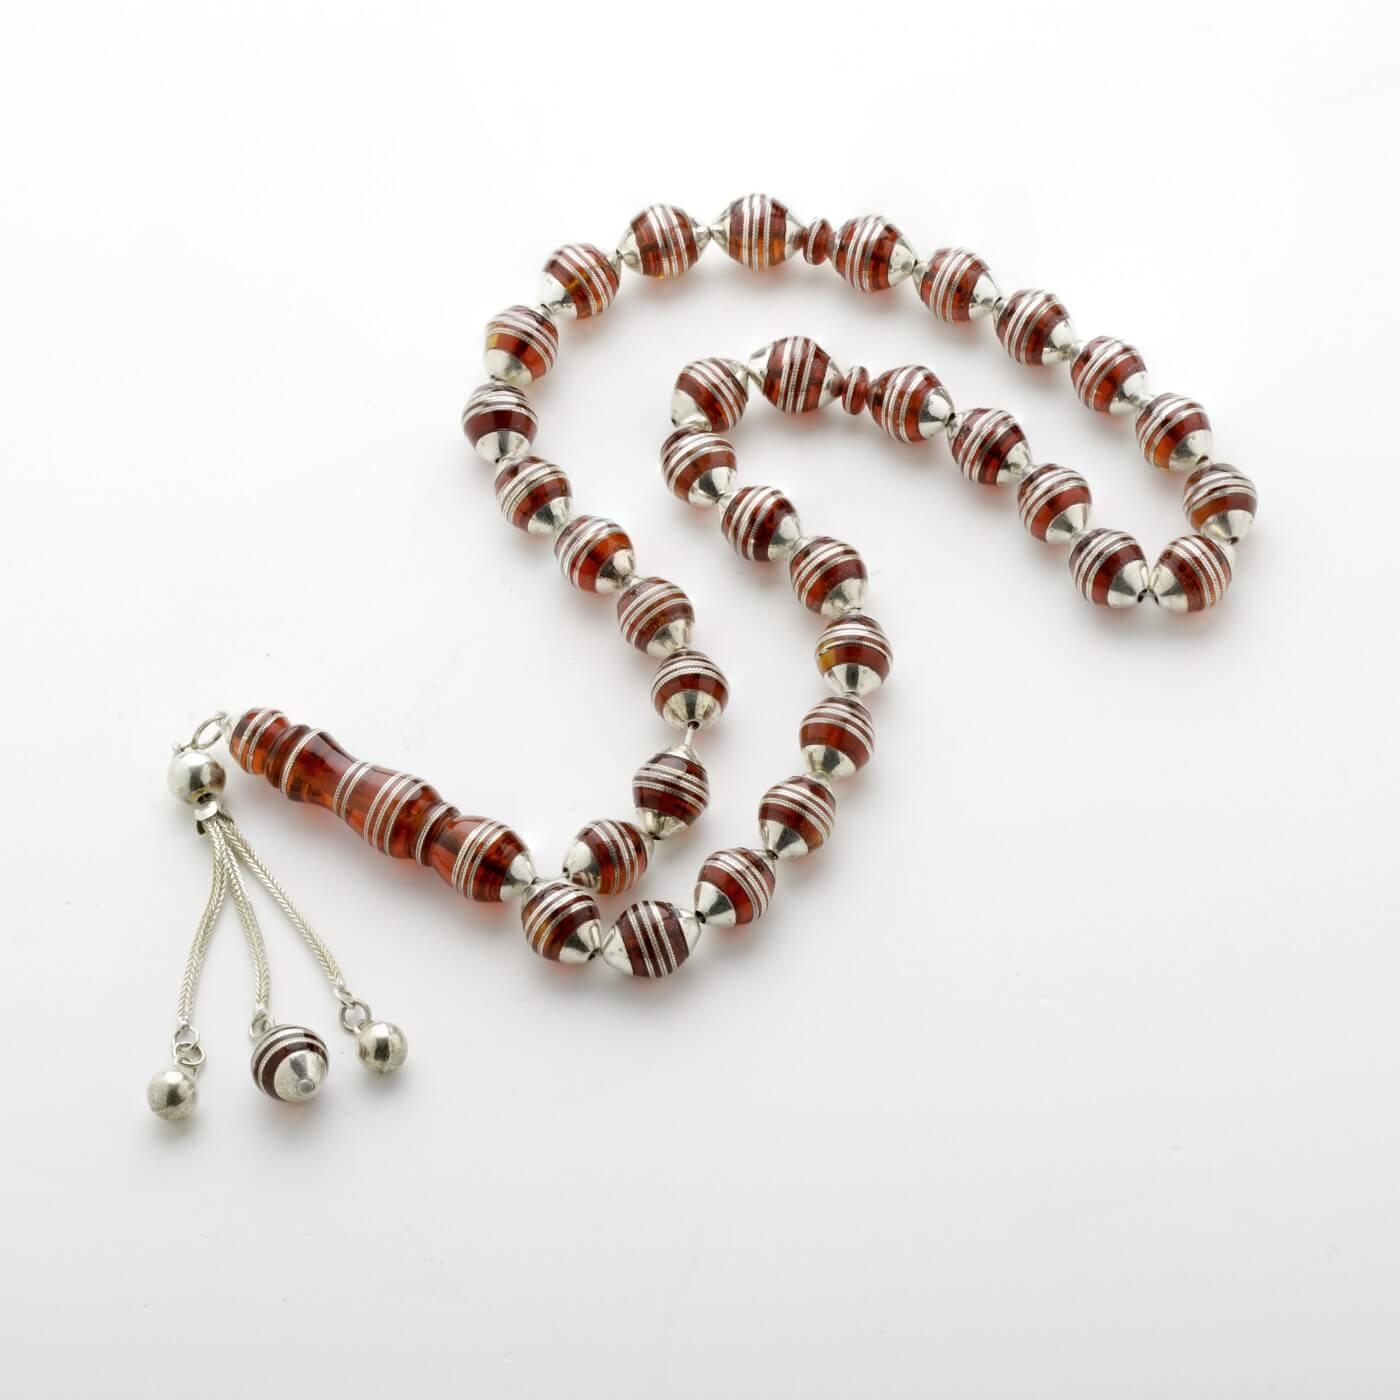 German Prayer Beads